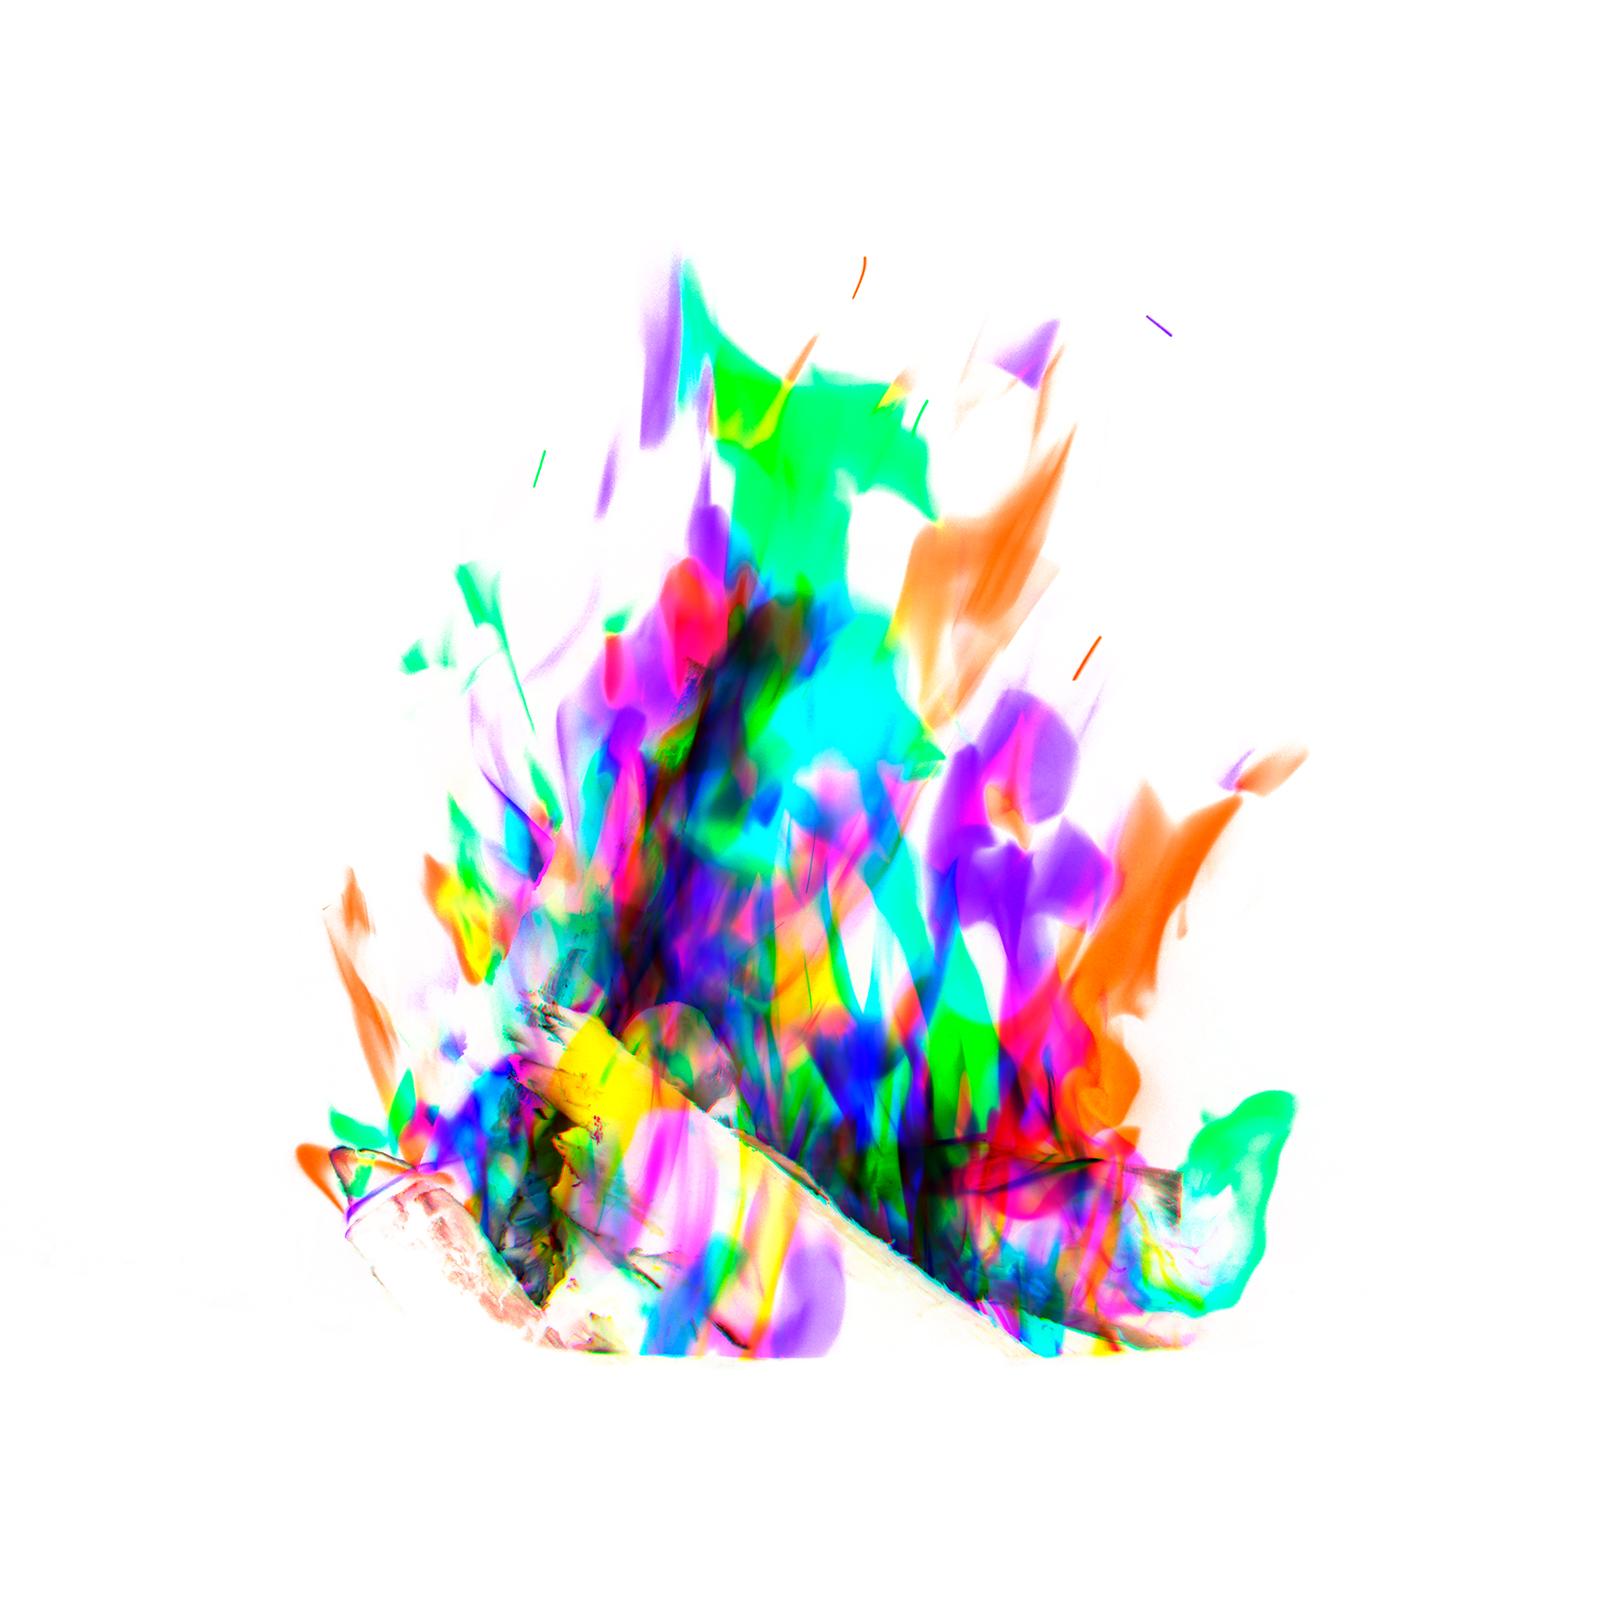 RGB_whidbey_fire_07-1-invert.jpg